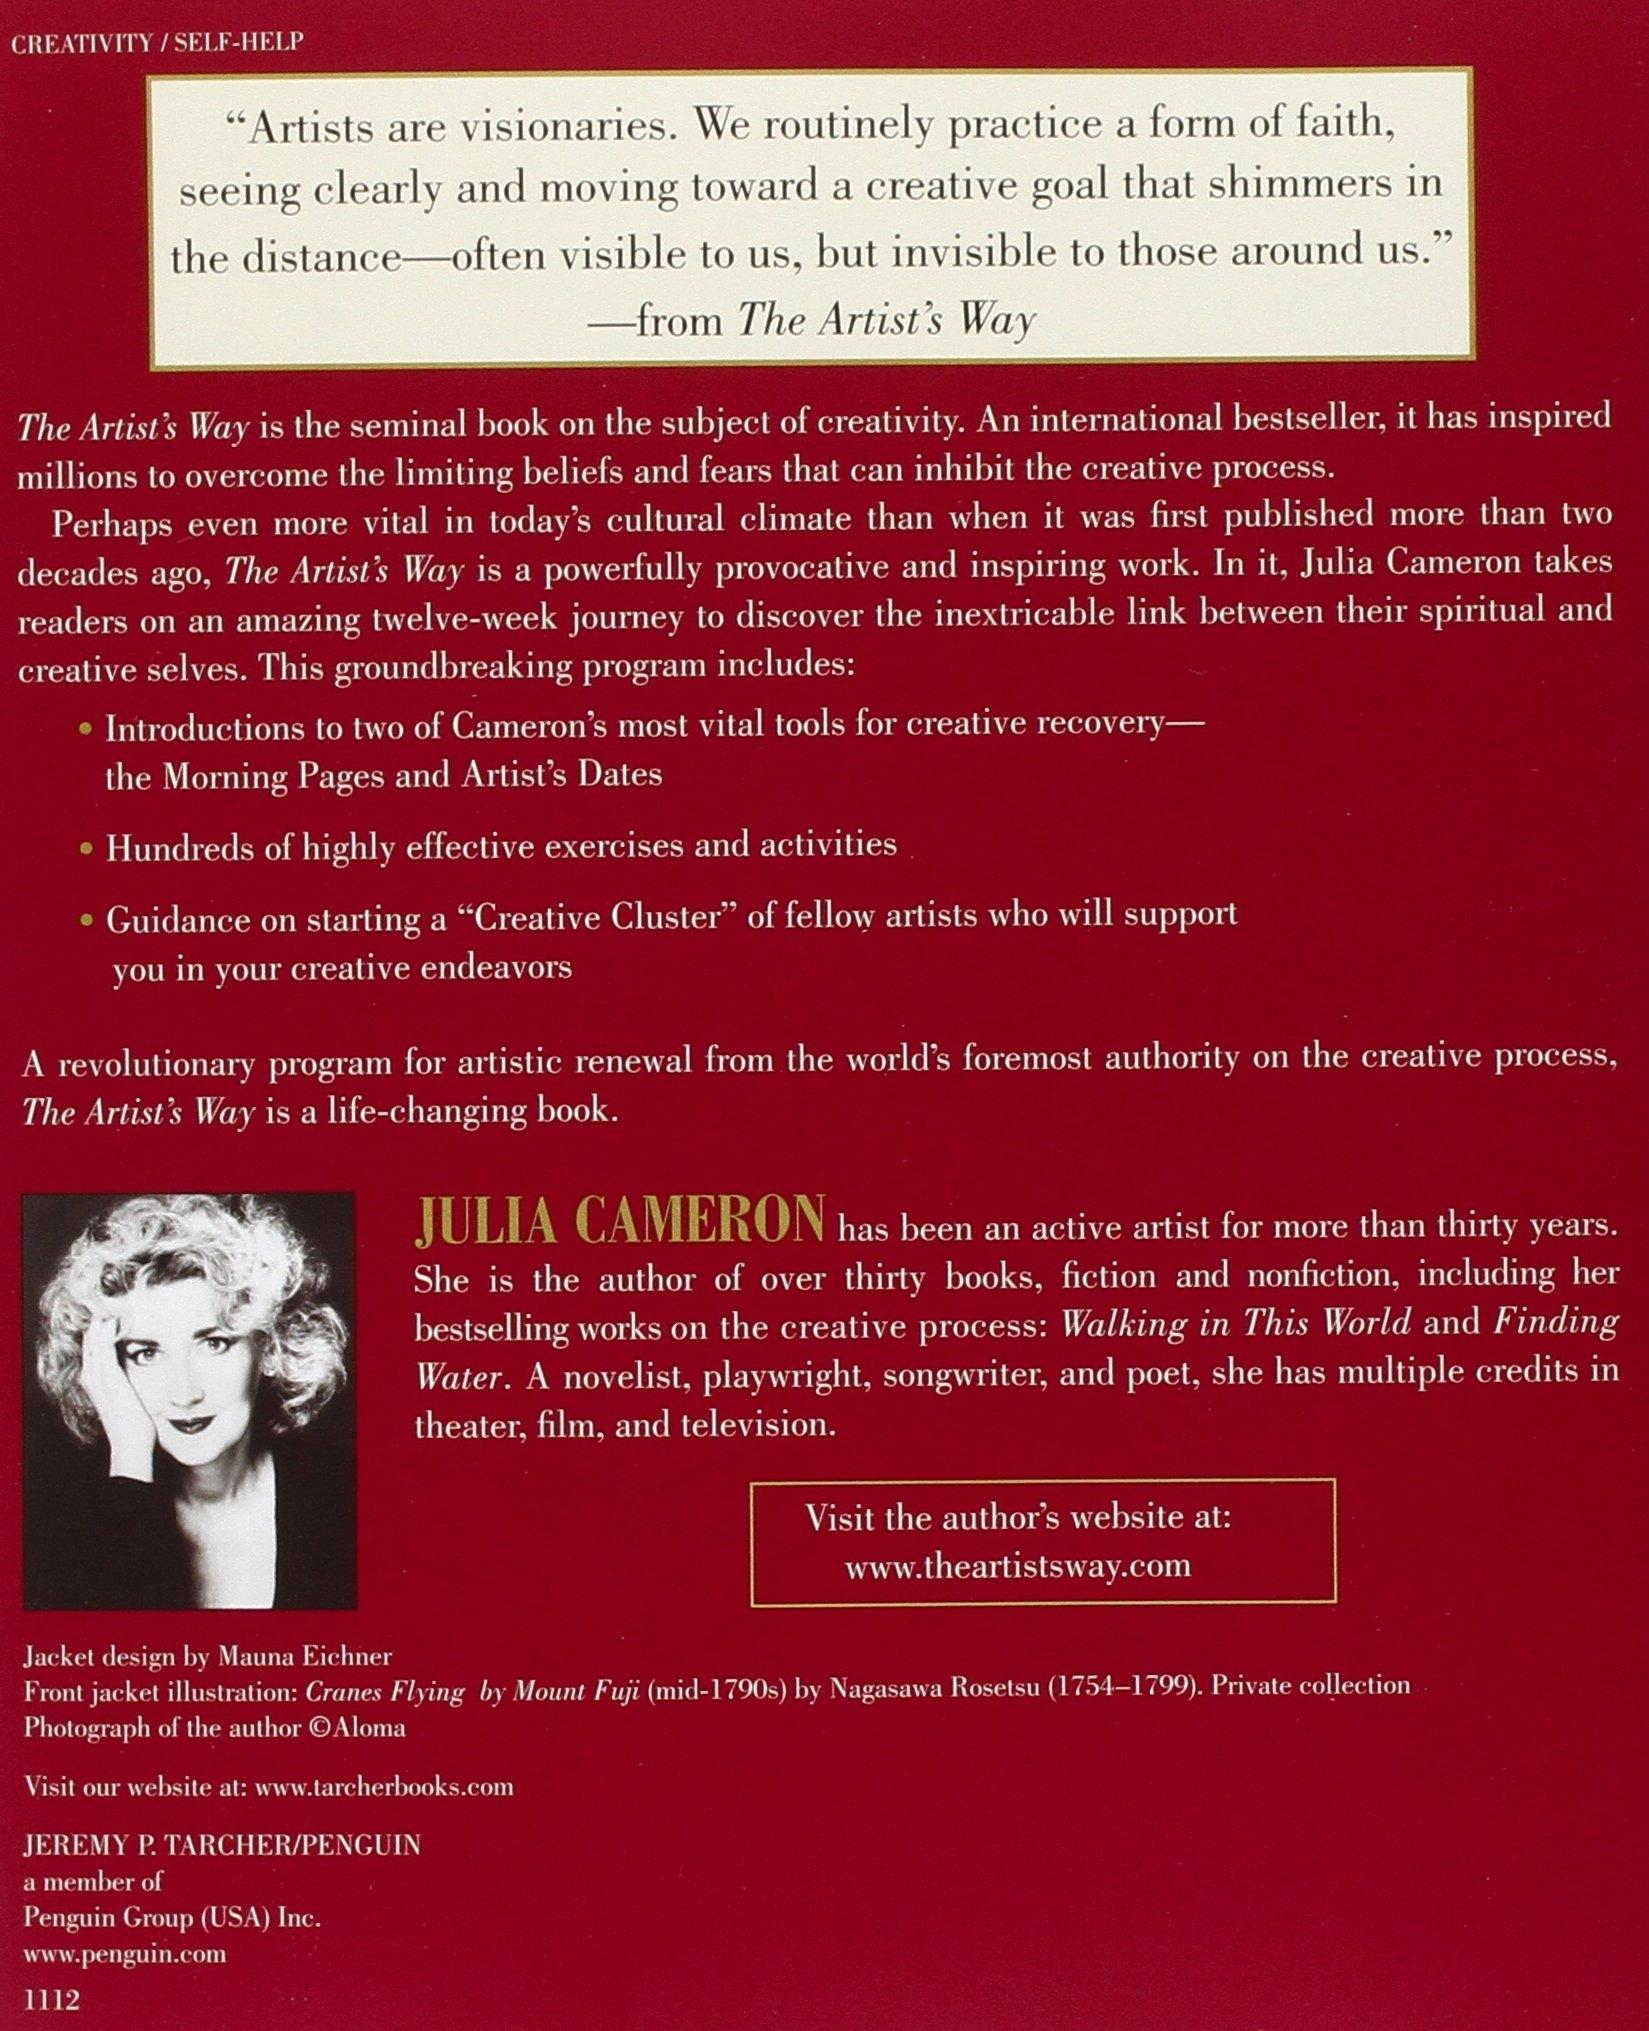 The Artist's Way Starter Kit: Julia Cameron: 9781585429288: Amazon.com:  Books